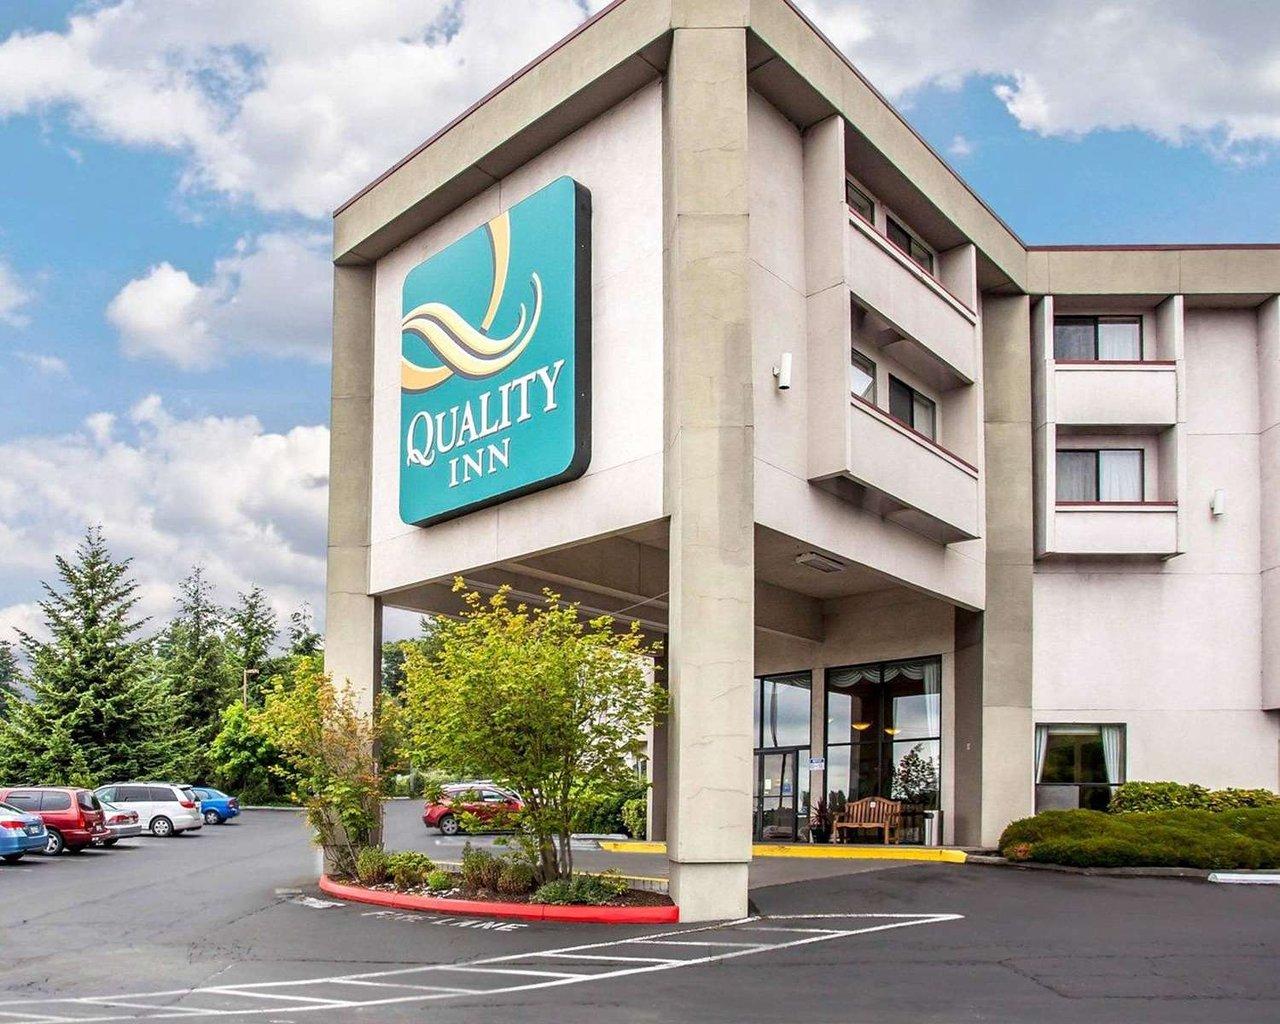 quality inn 76 1 1 2 updated 2019 prices hotel reviews rh tripadvisor com